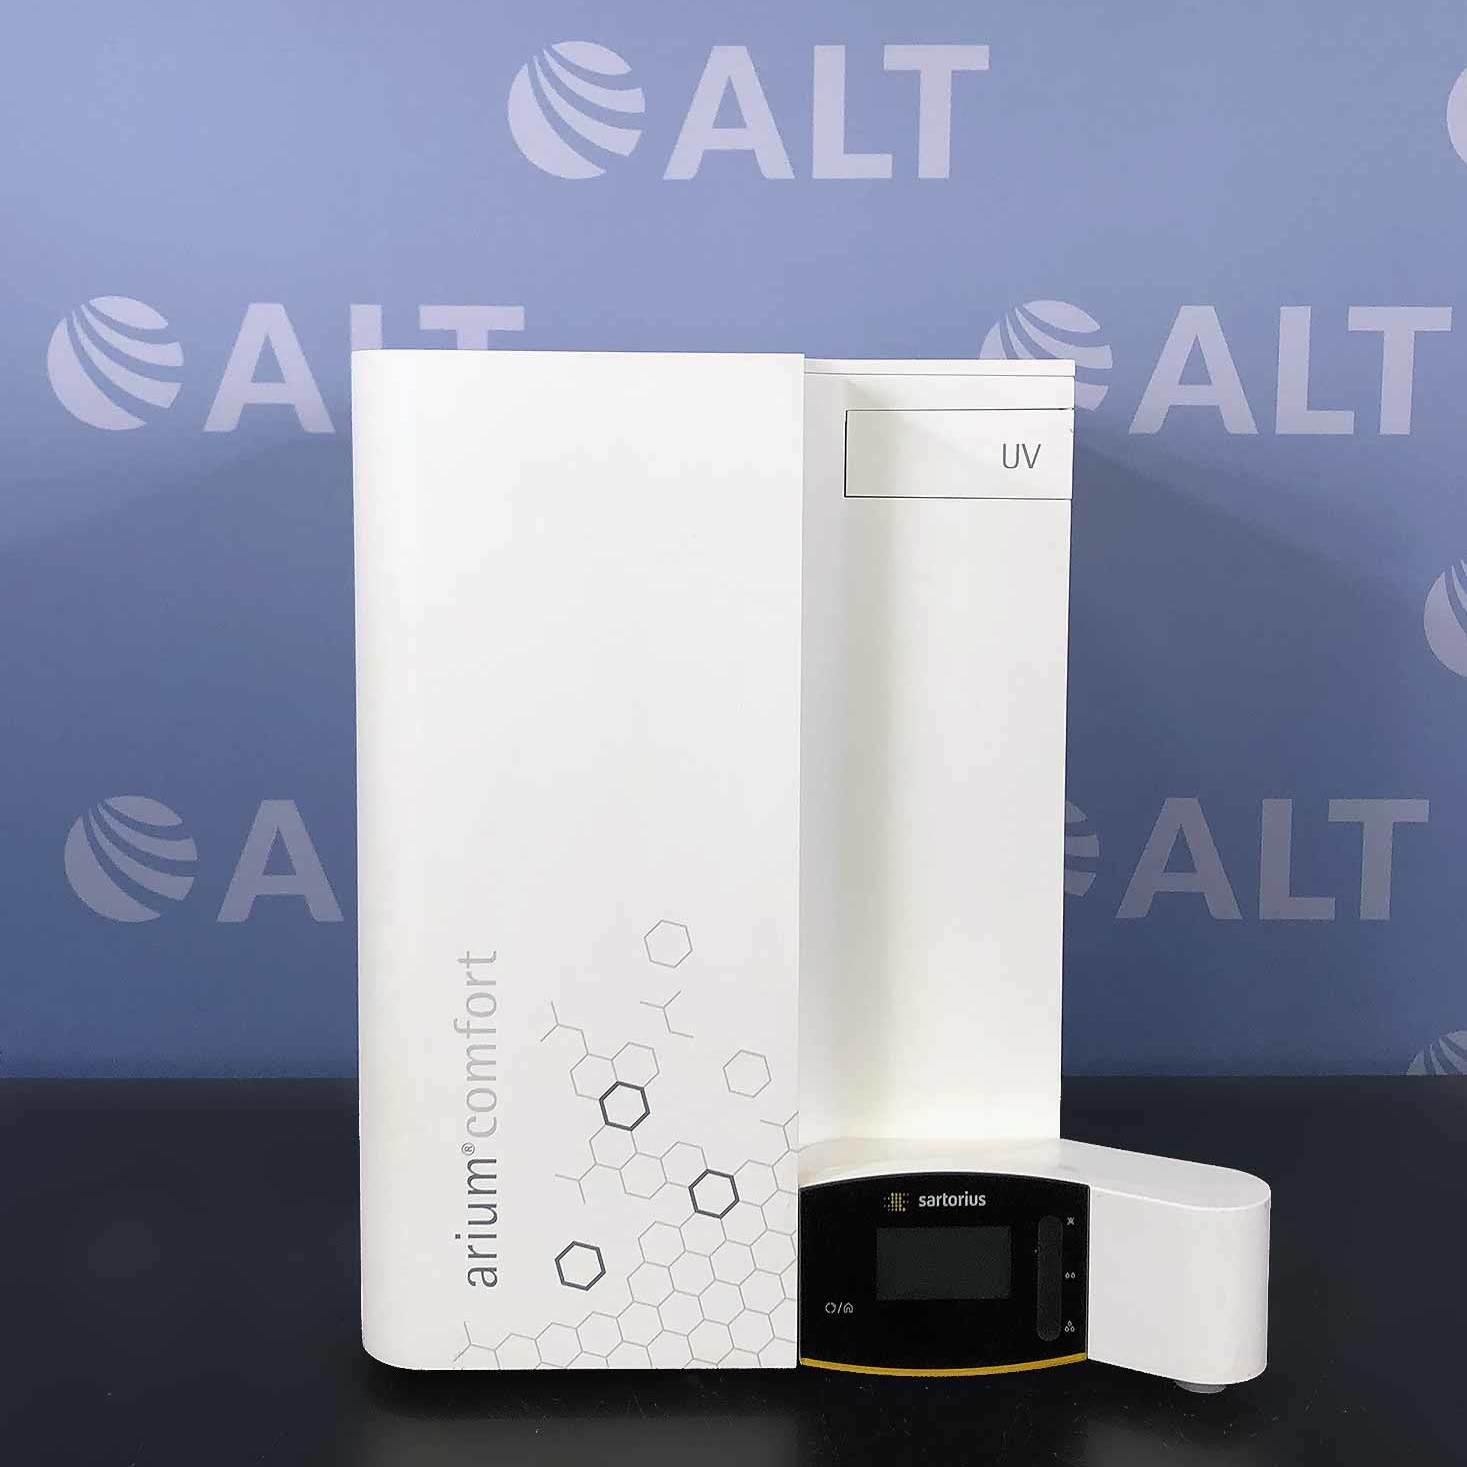 H2O-I-1-UV-T Arium Comfort I Ultrapure Water System Name